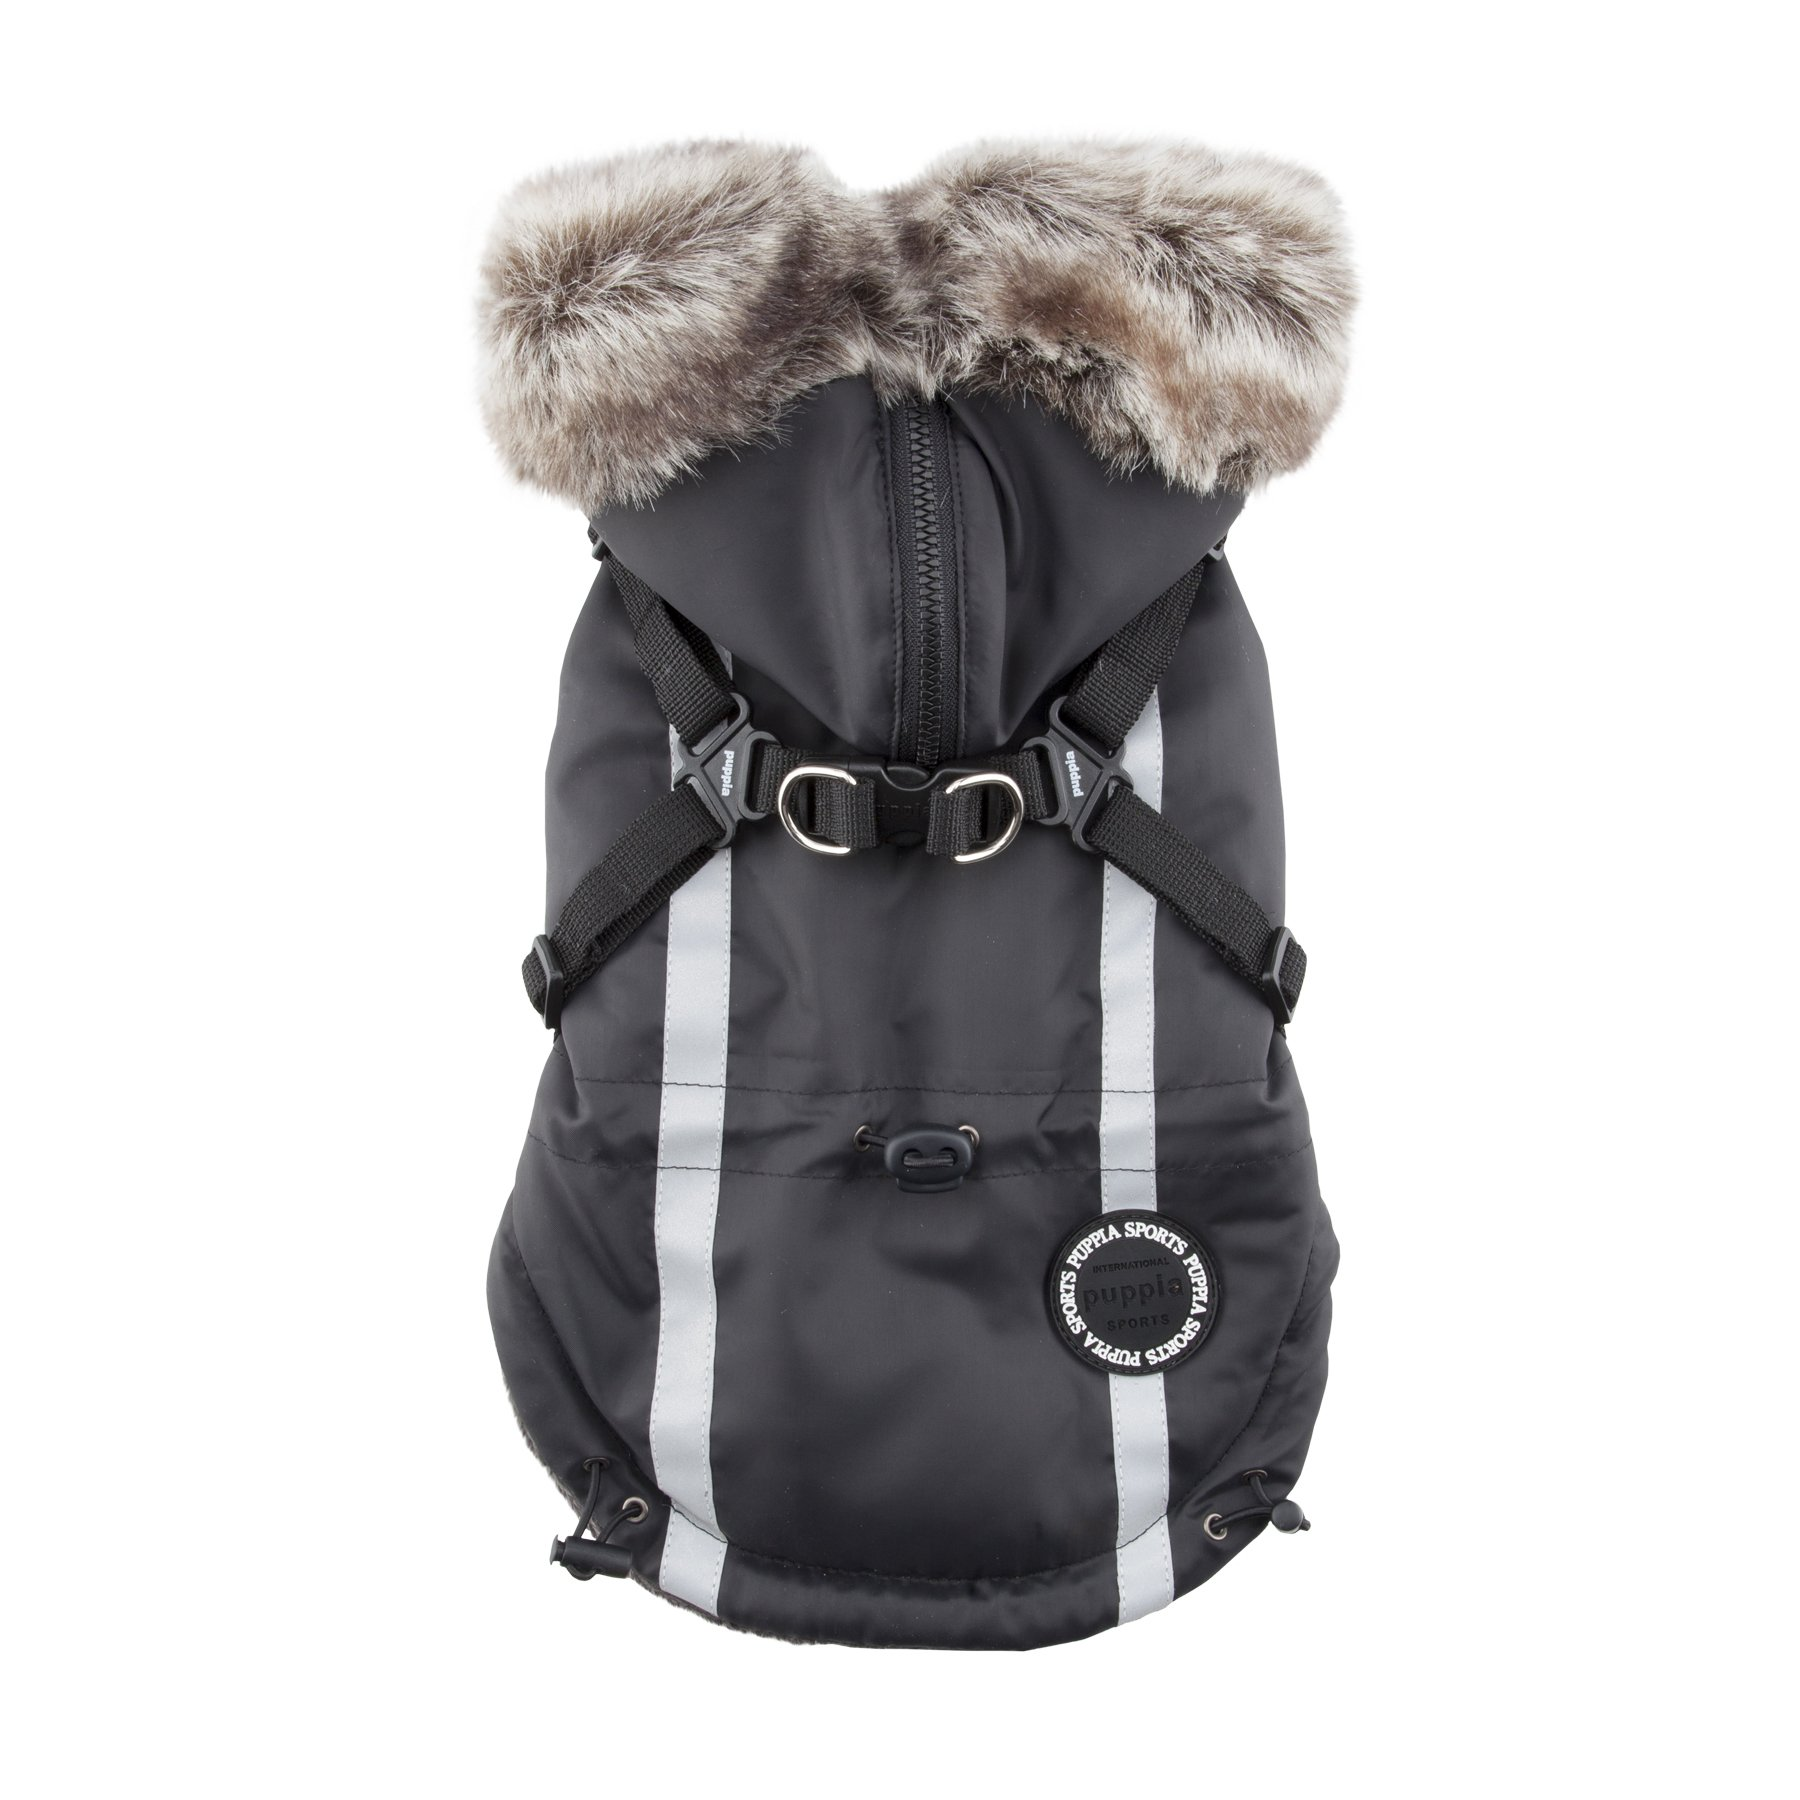 Puppia Clark Winter Fleece Vest, X-Large, Black